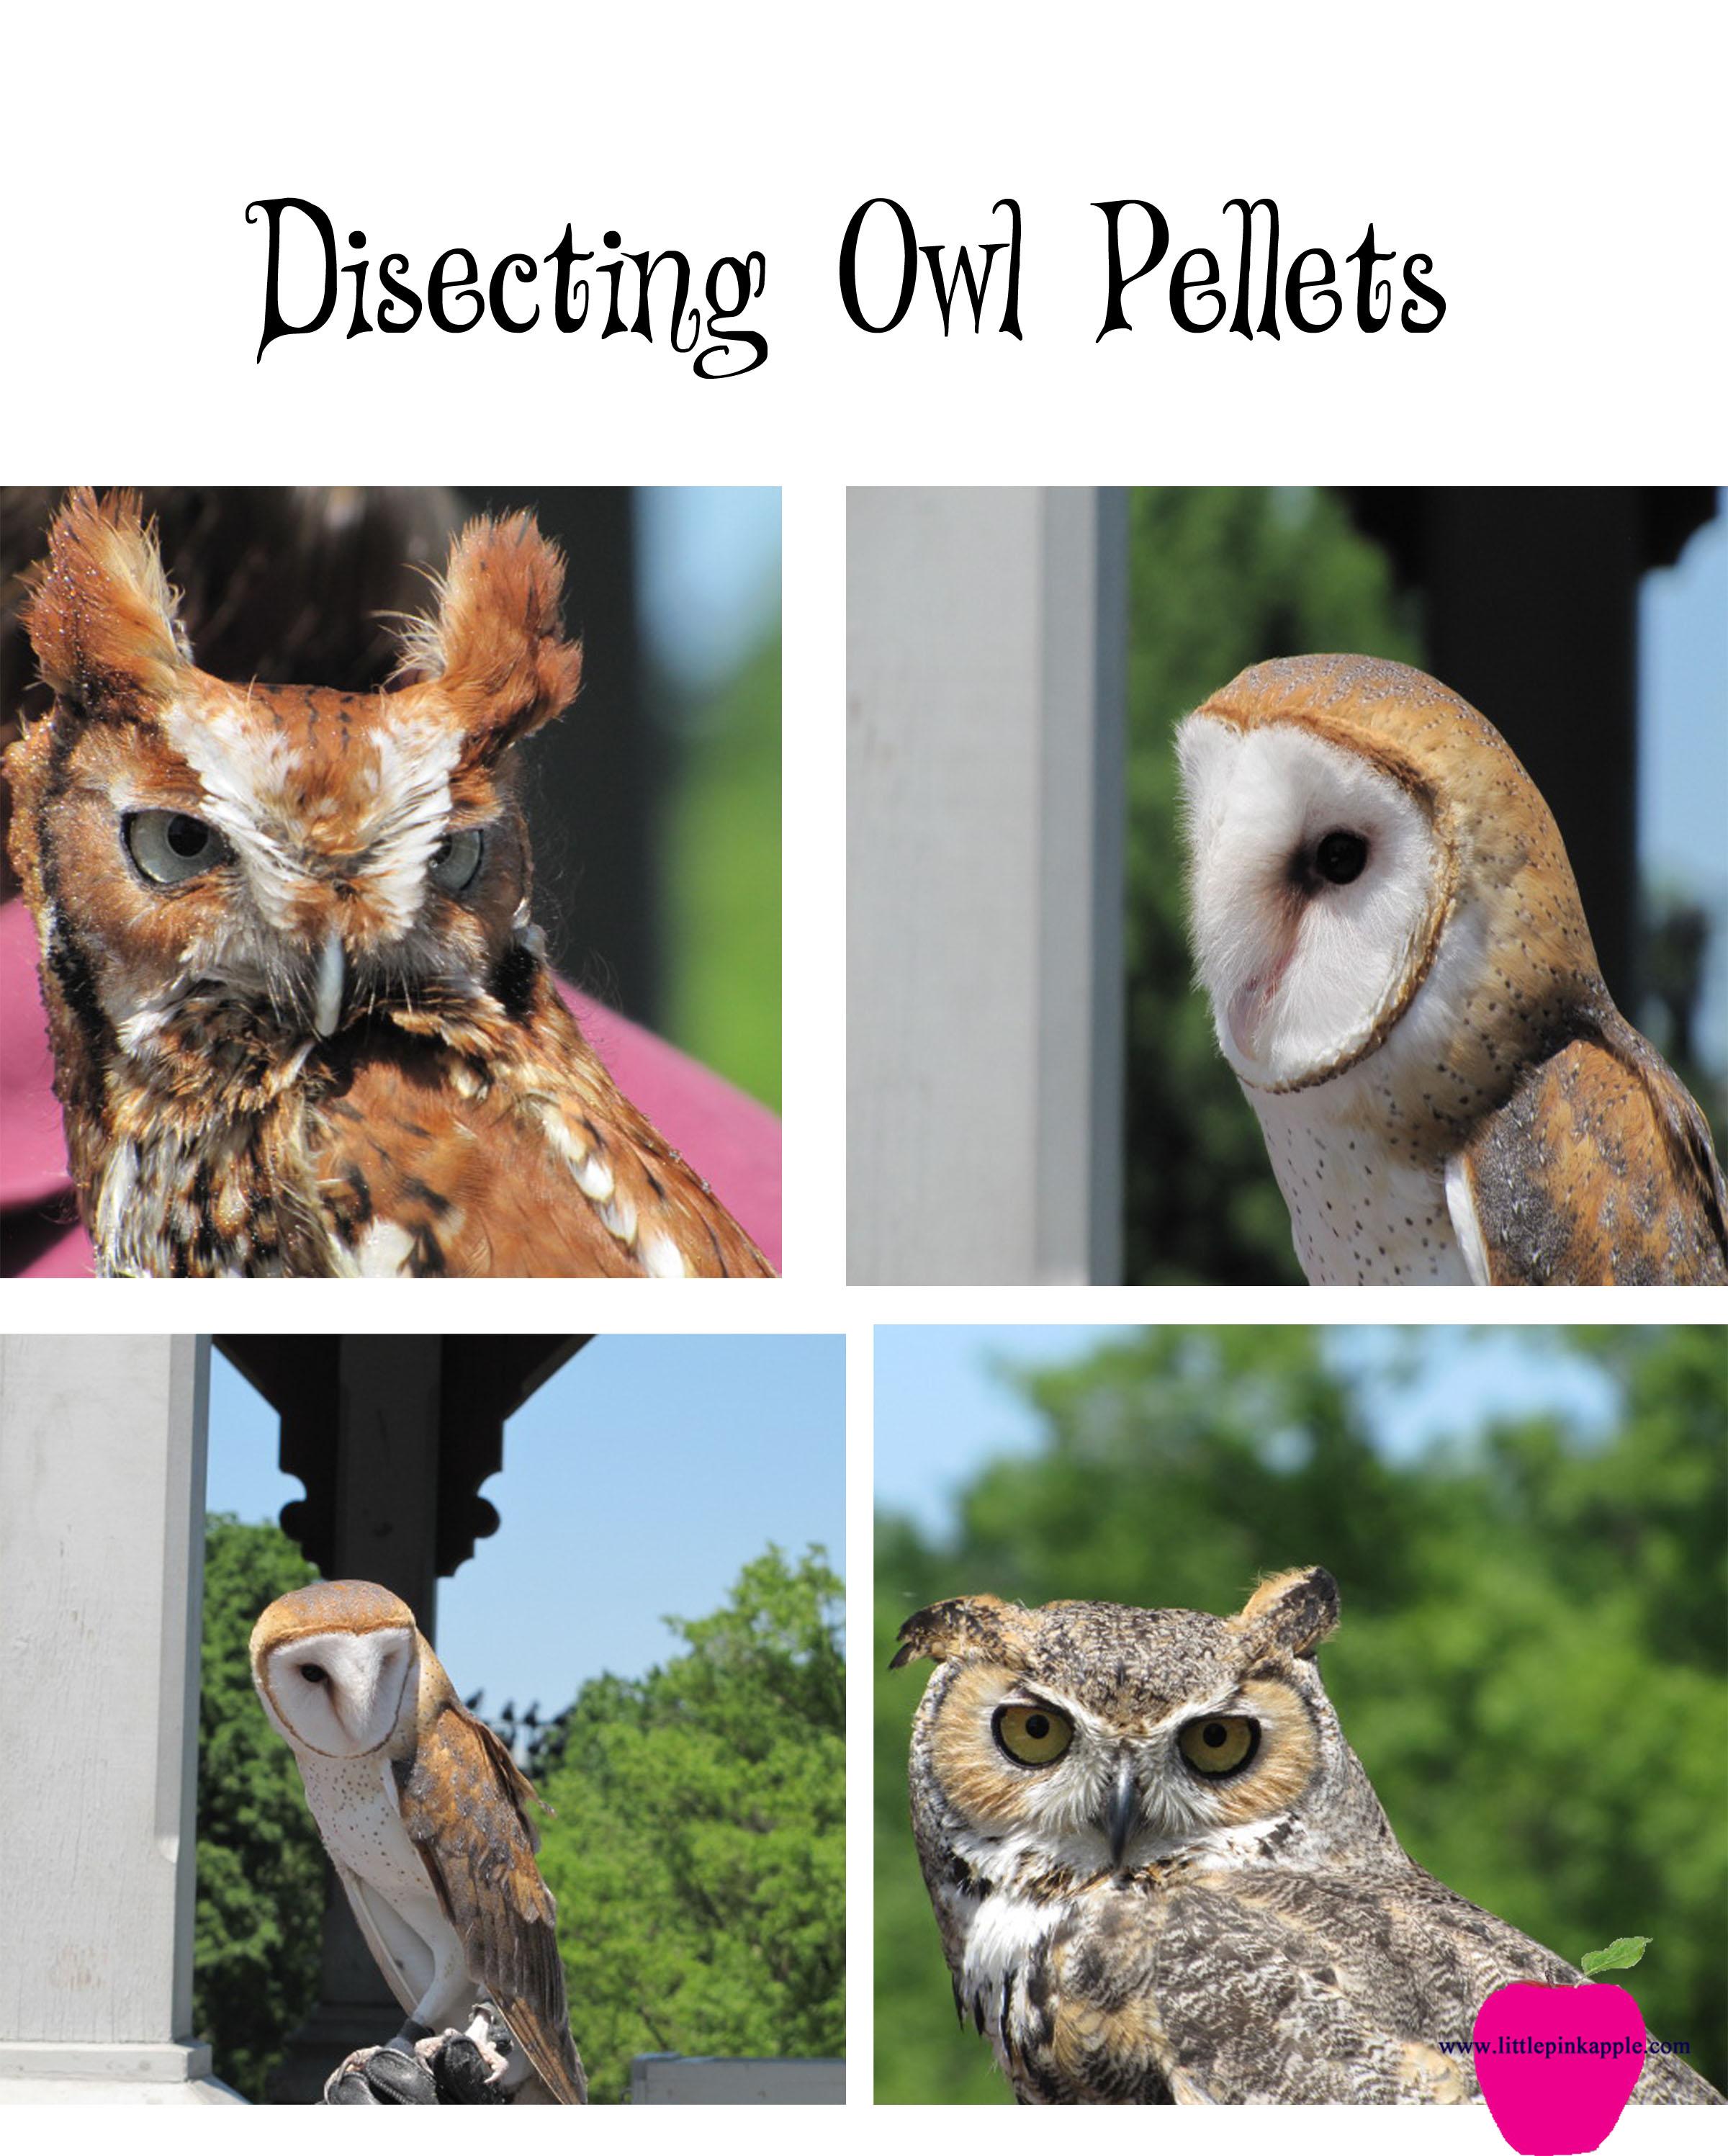 disecting pellets logo